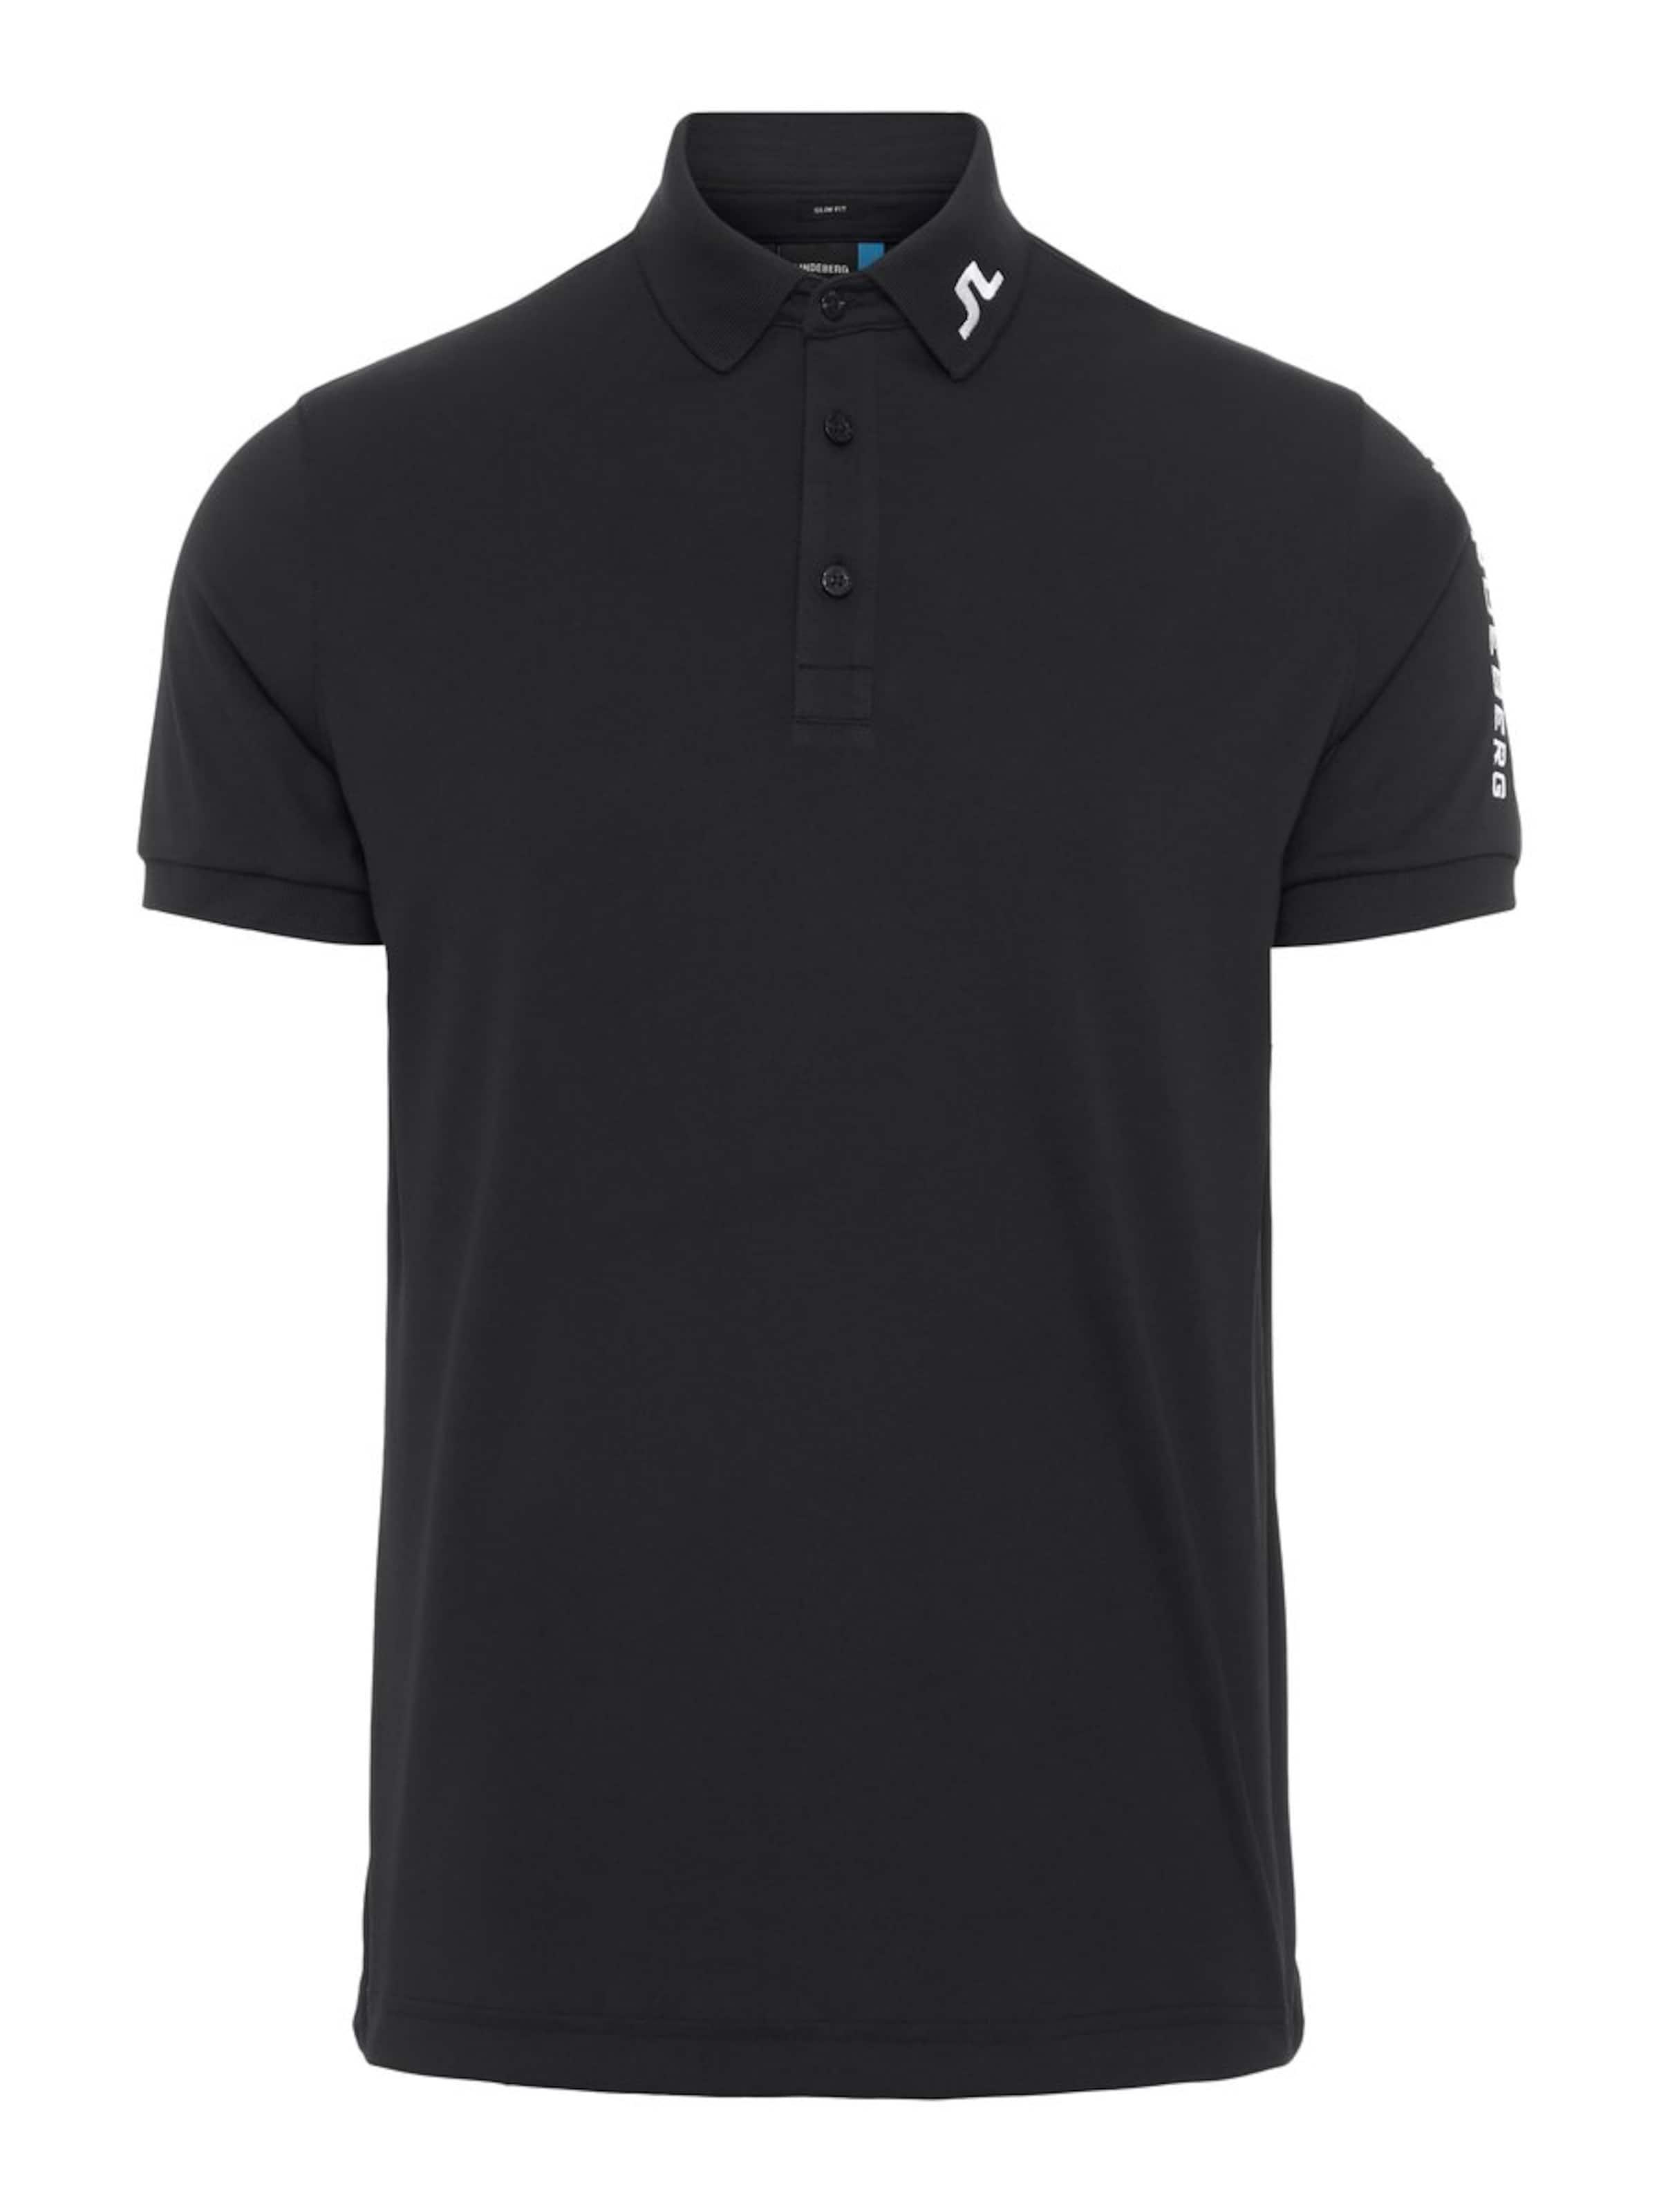 J shirt T Rouge lindeberg En oWdeExBQCr